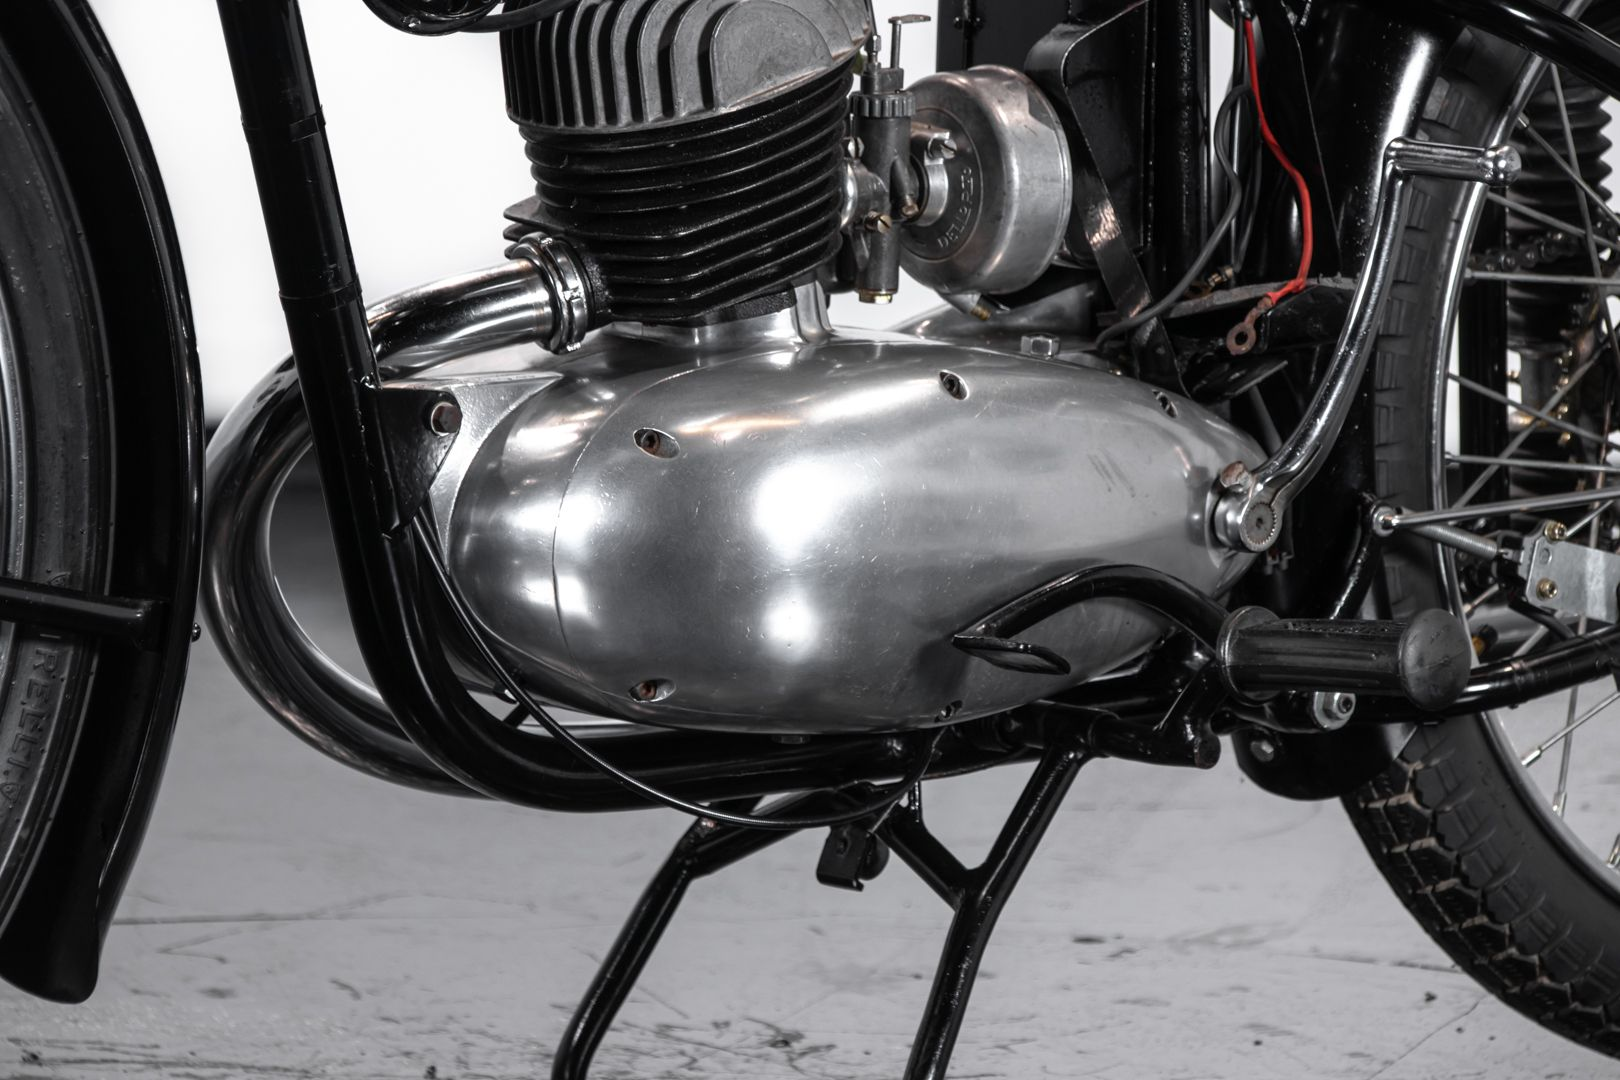 1952 Moto Morini Motore Lungo 2T 125 78776